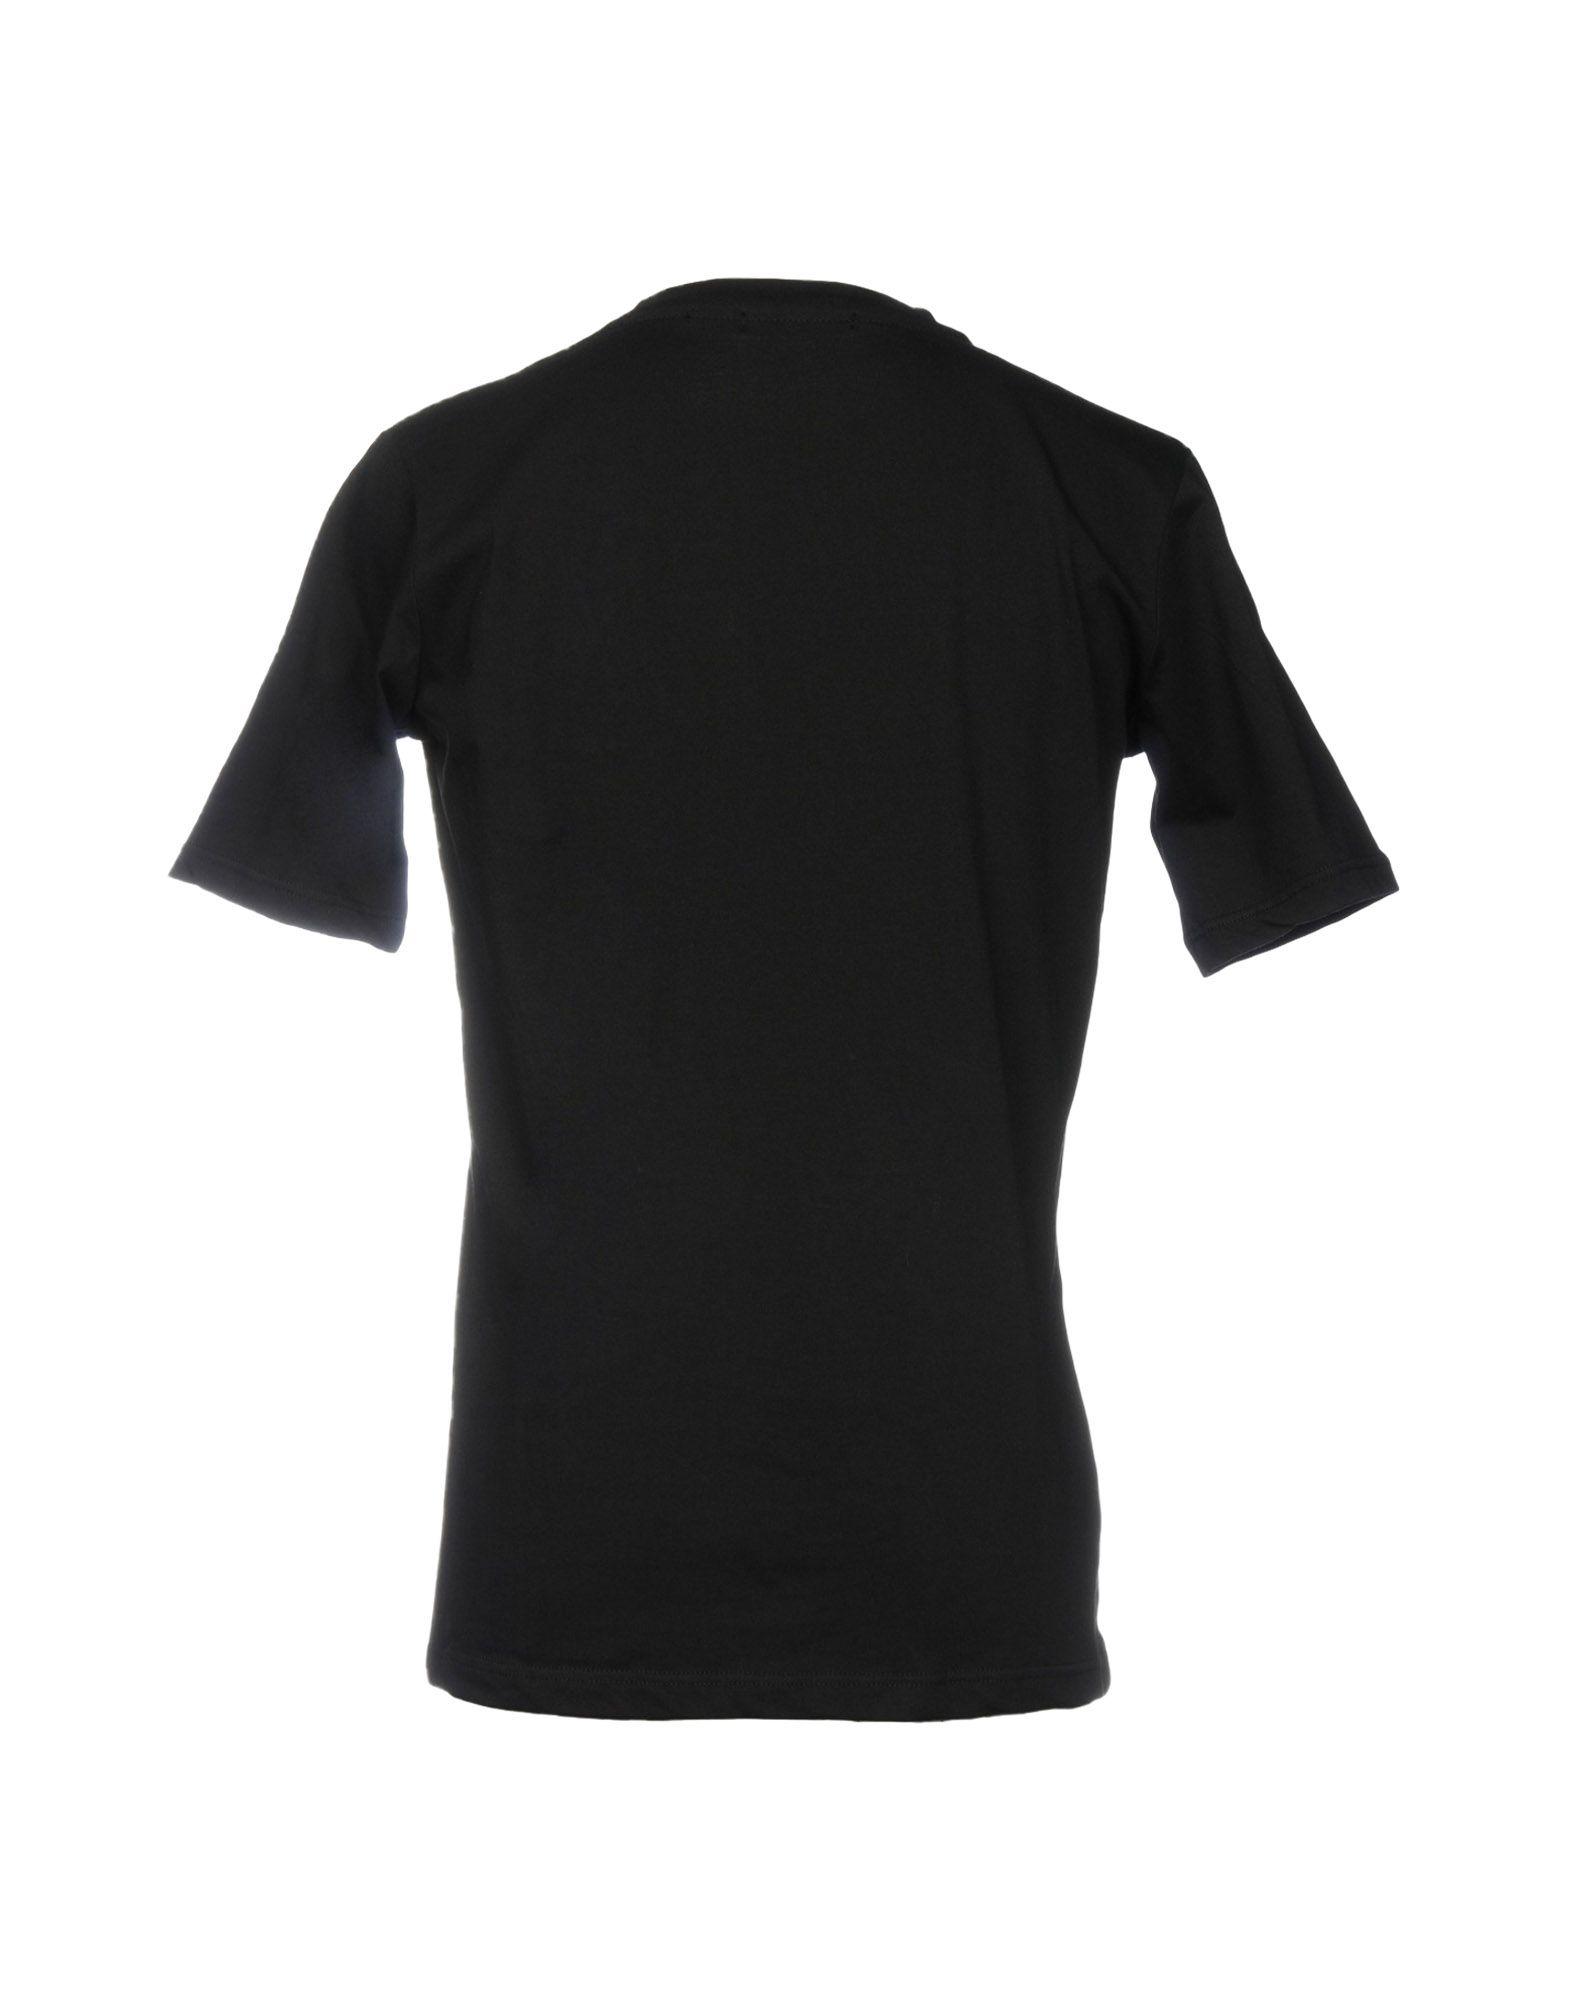 T-Shirt Les Bohēmiens Bohēmiens Bohēmiens Uomo - 12132347OW b4dafa